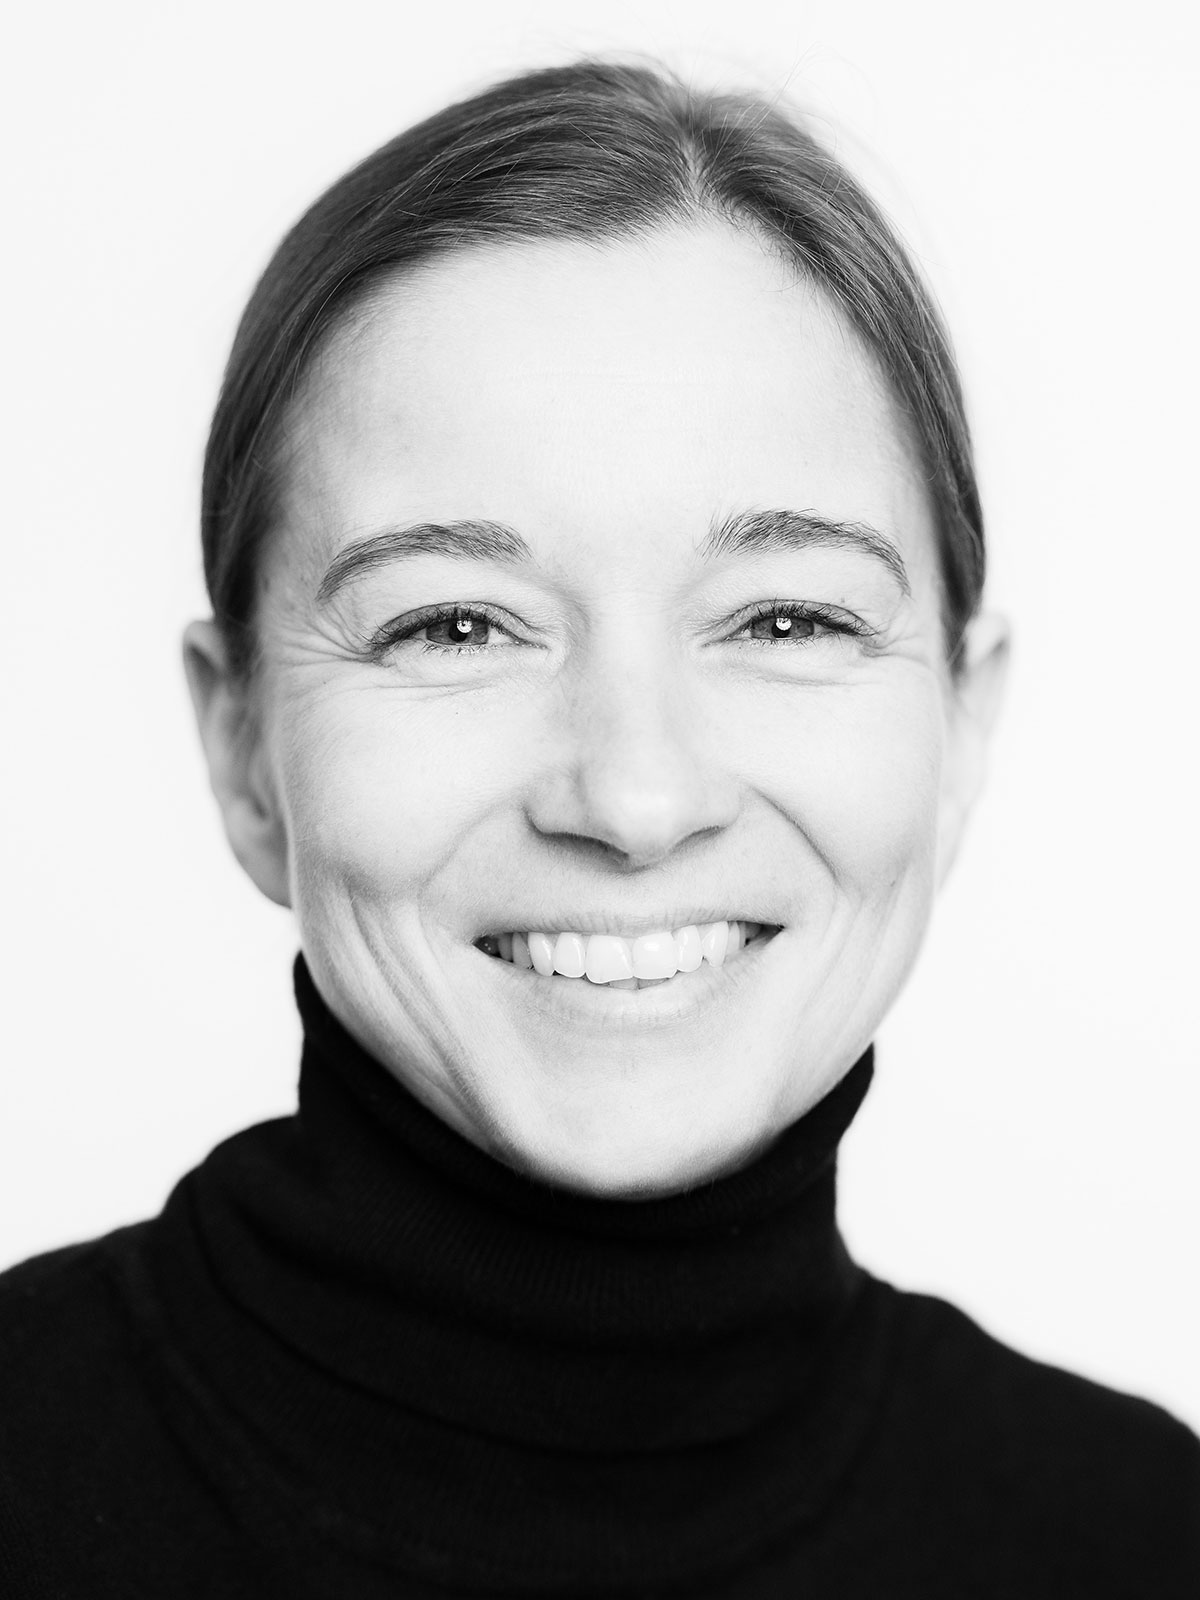 D5sign Gründerin DI (FH) Evelyn Schlagbauer - Foto: Stefan Sappert | Auftragsfoto.at